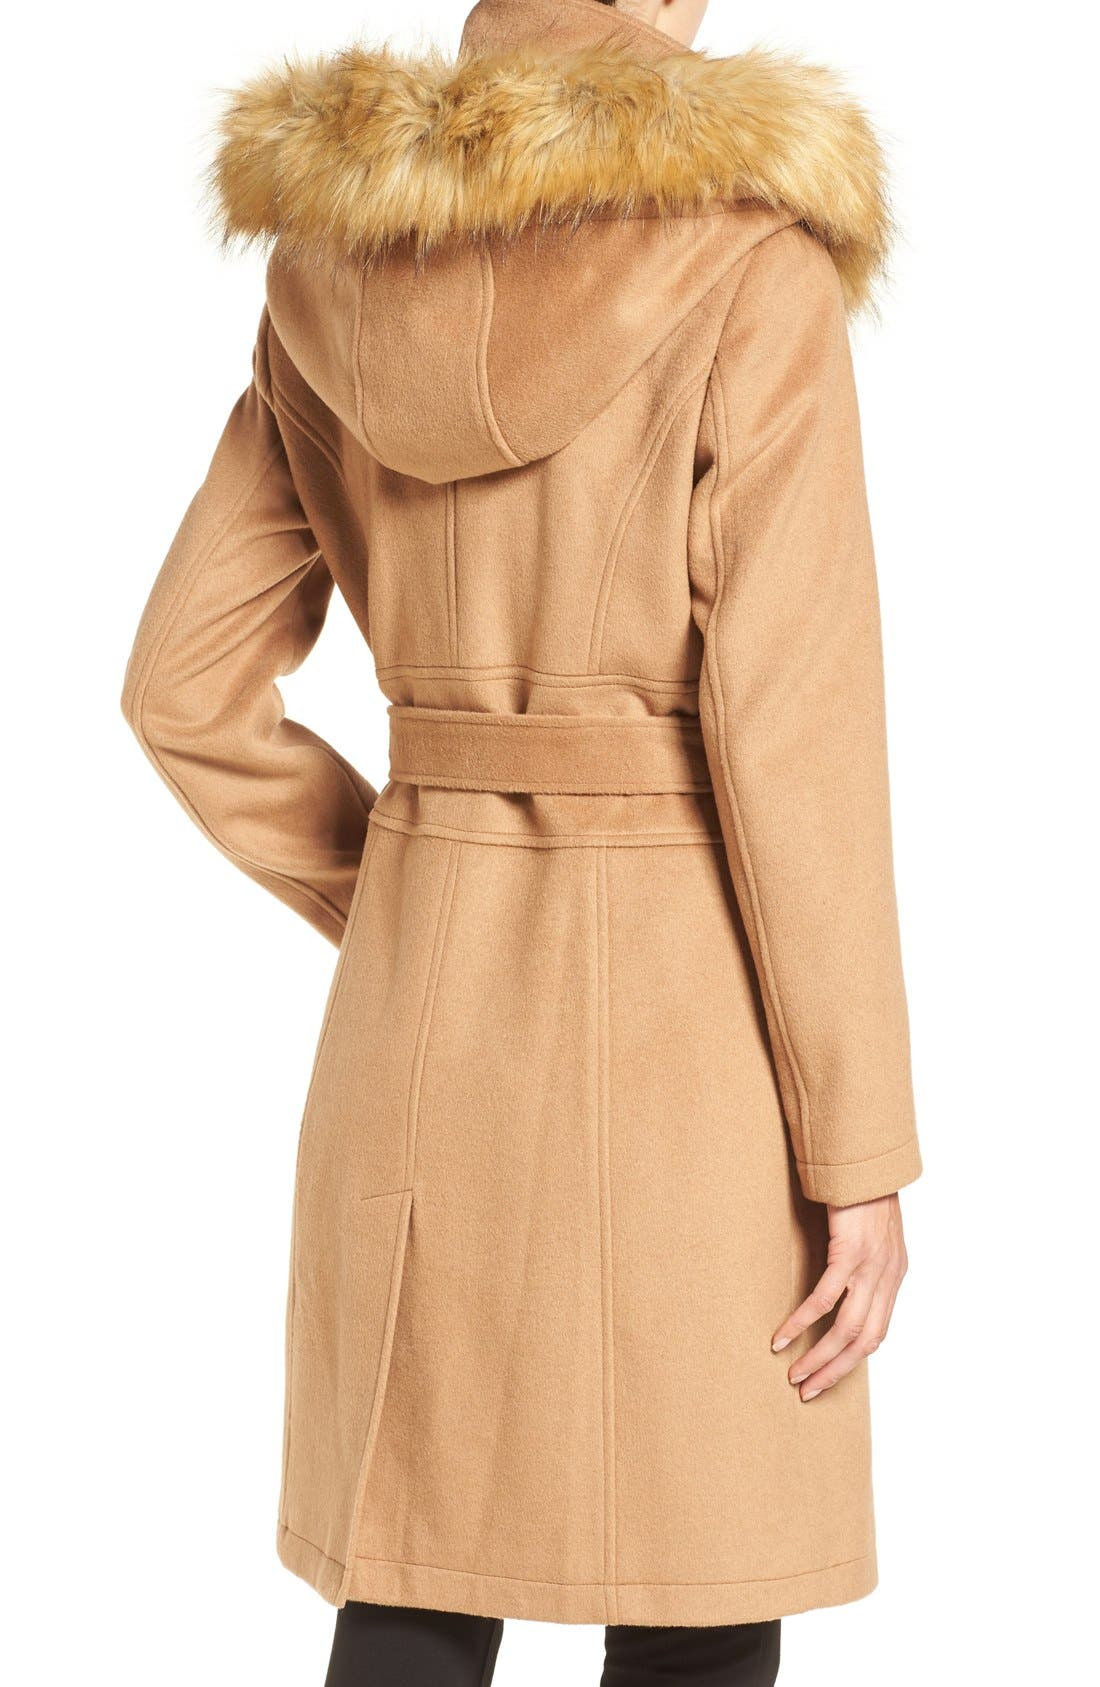 Alternate Image 2  - Ivanka Trump Wool Blend Coat with Removable Faux Fur Trim Hood